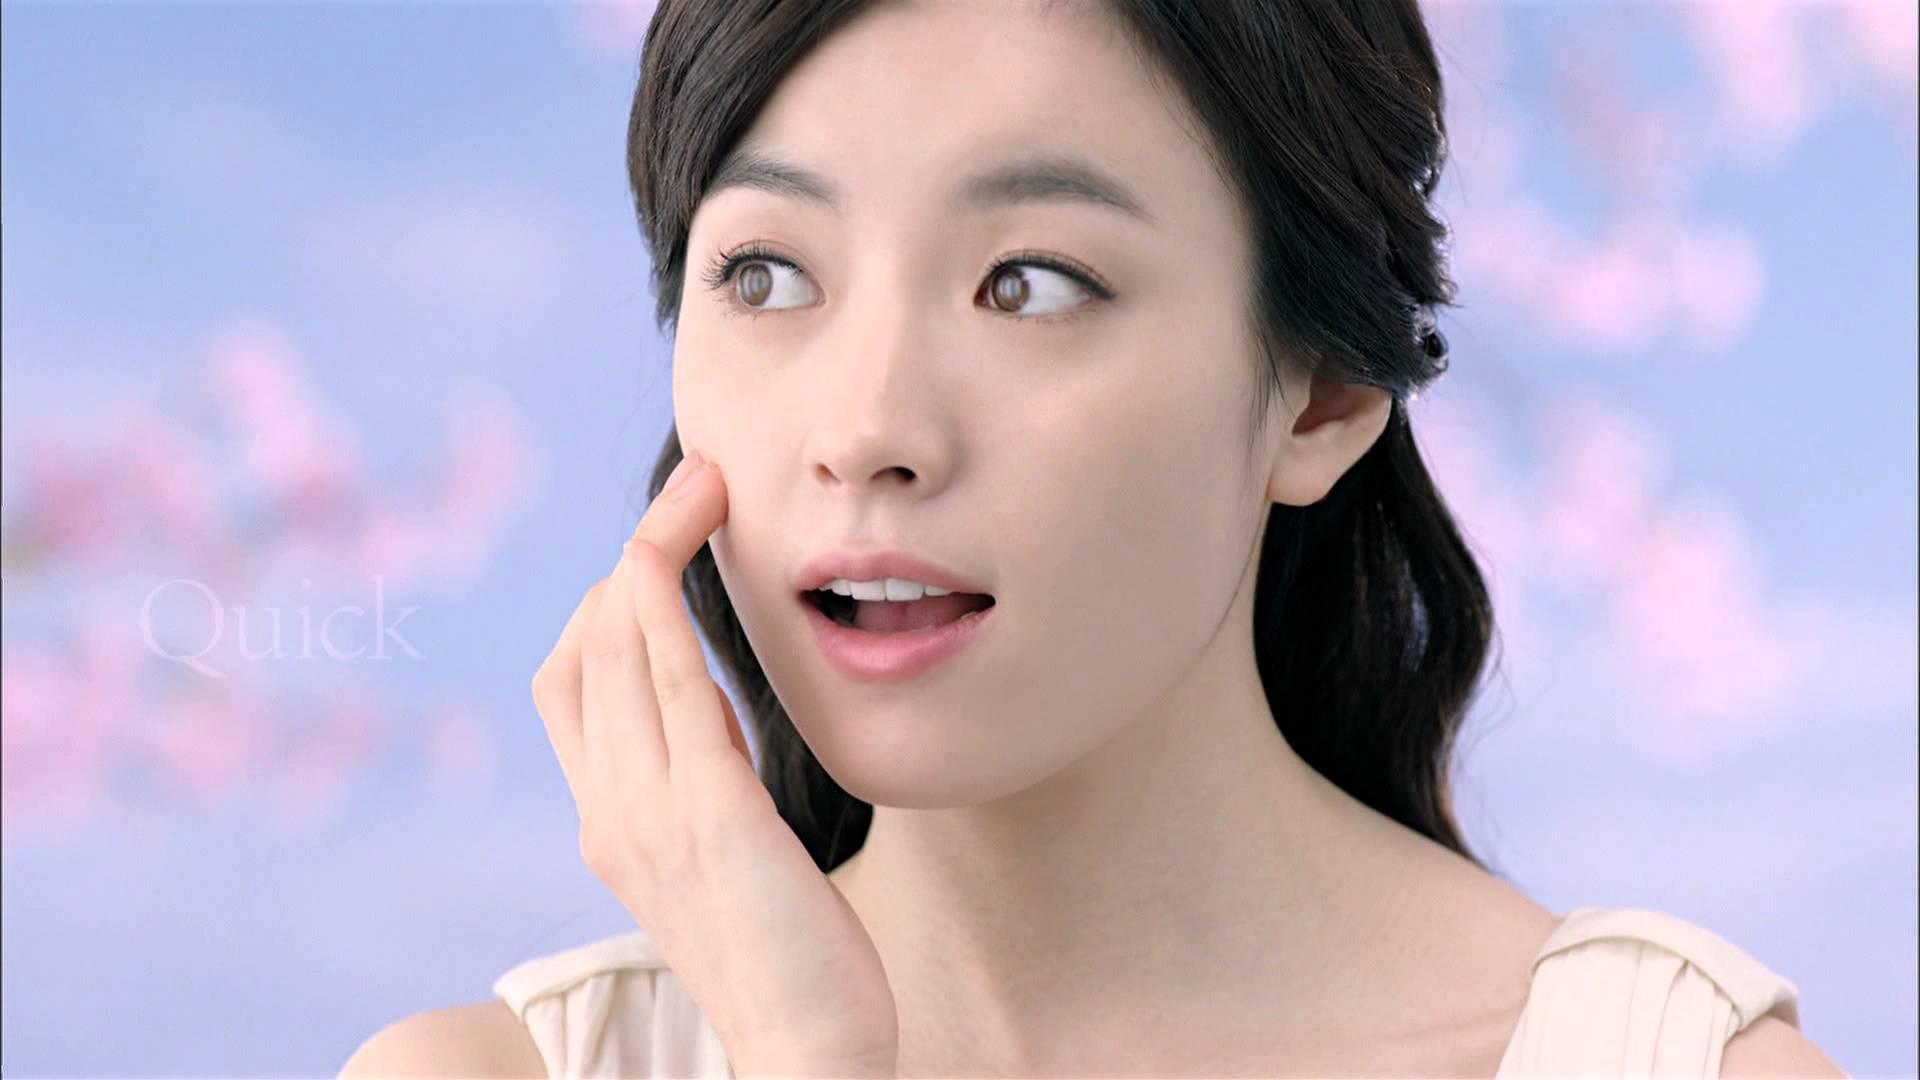 ♥ Han Hyo Joo ♥ - Han Hyo Joo Wallpaper (39490768) - Fanpop